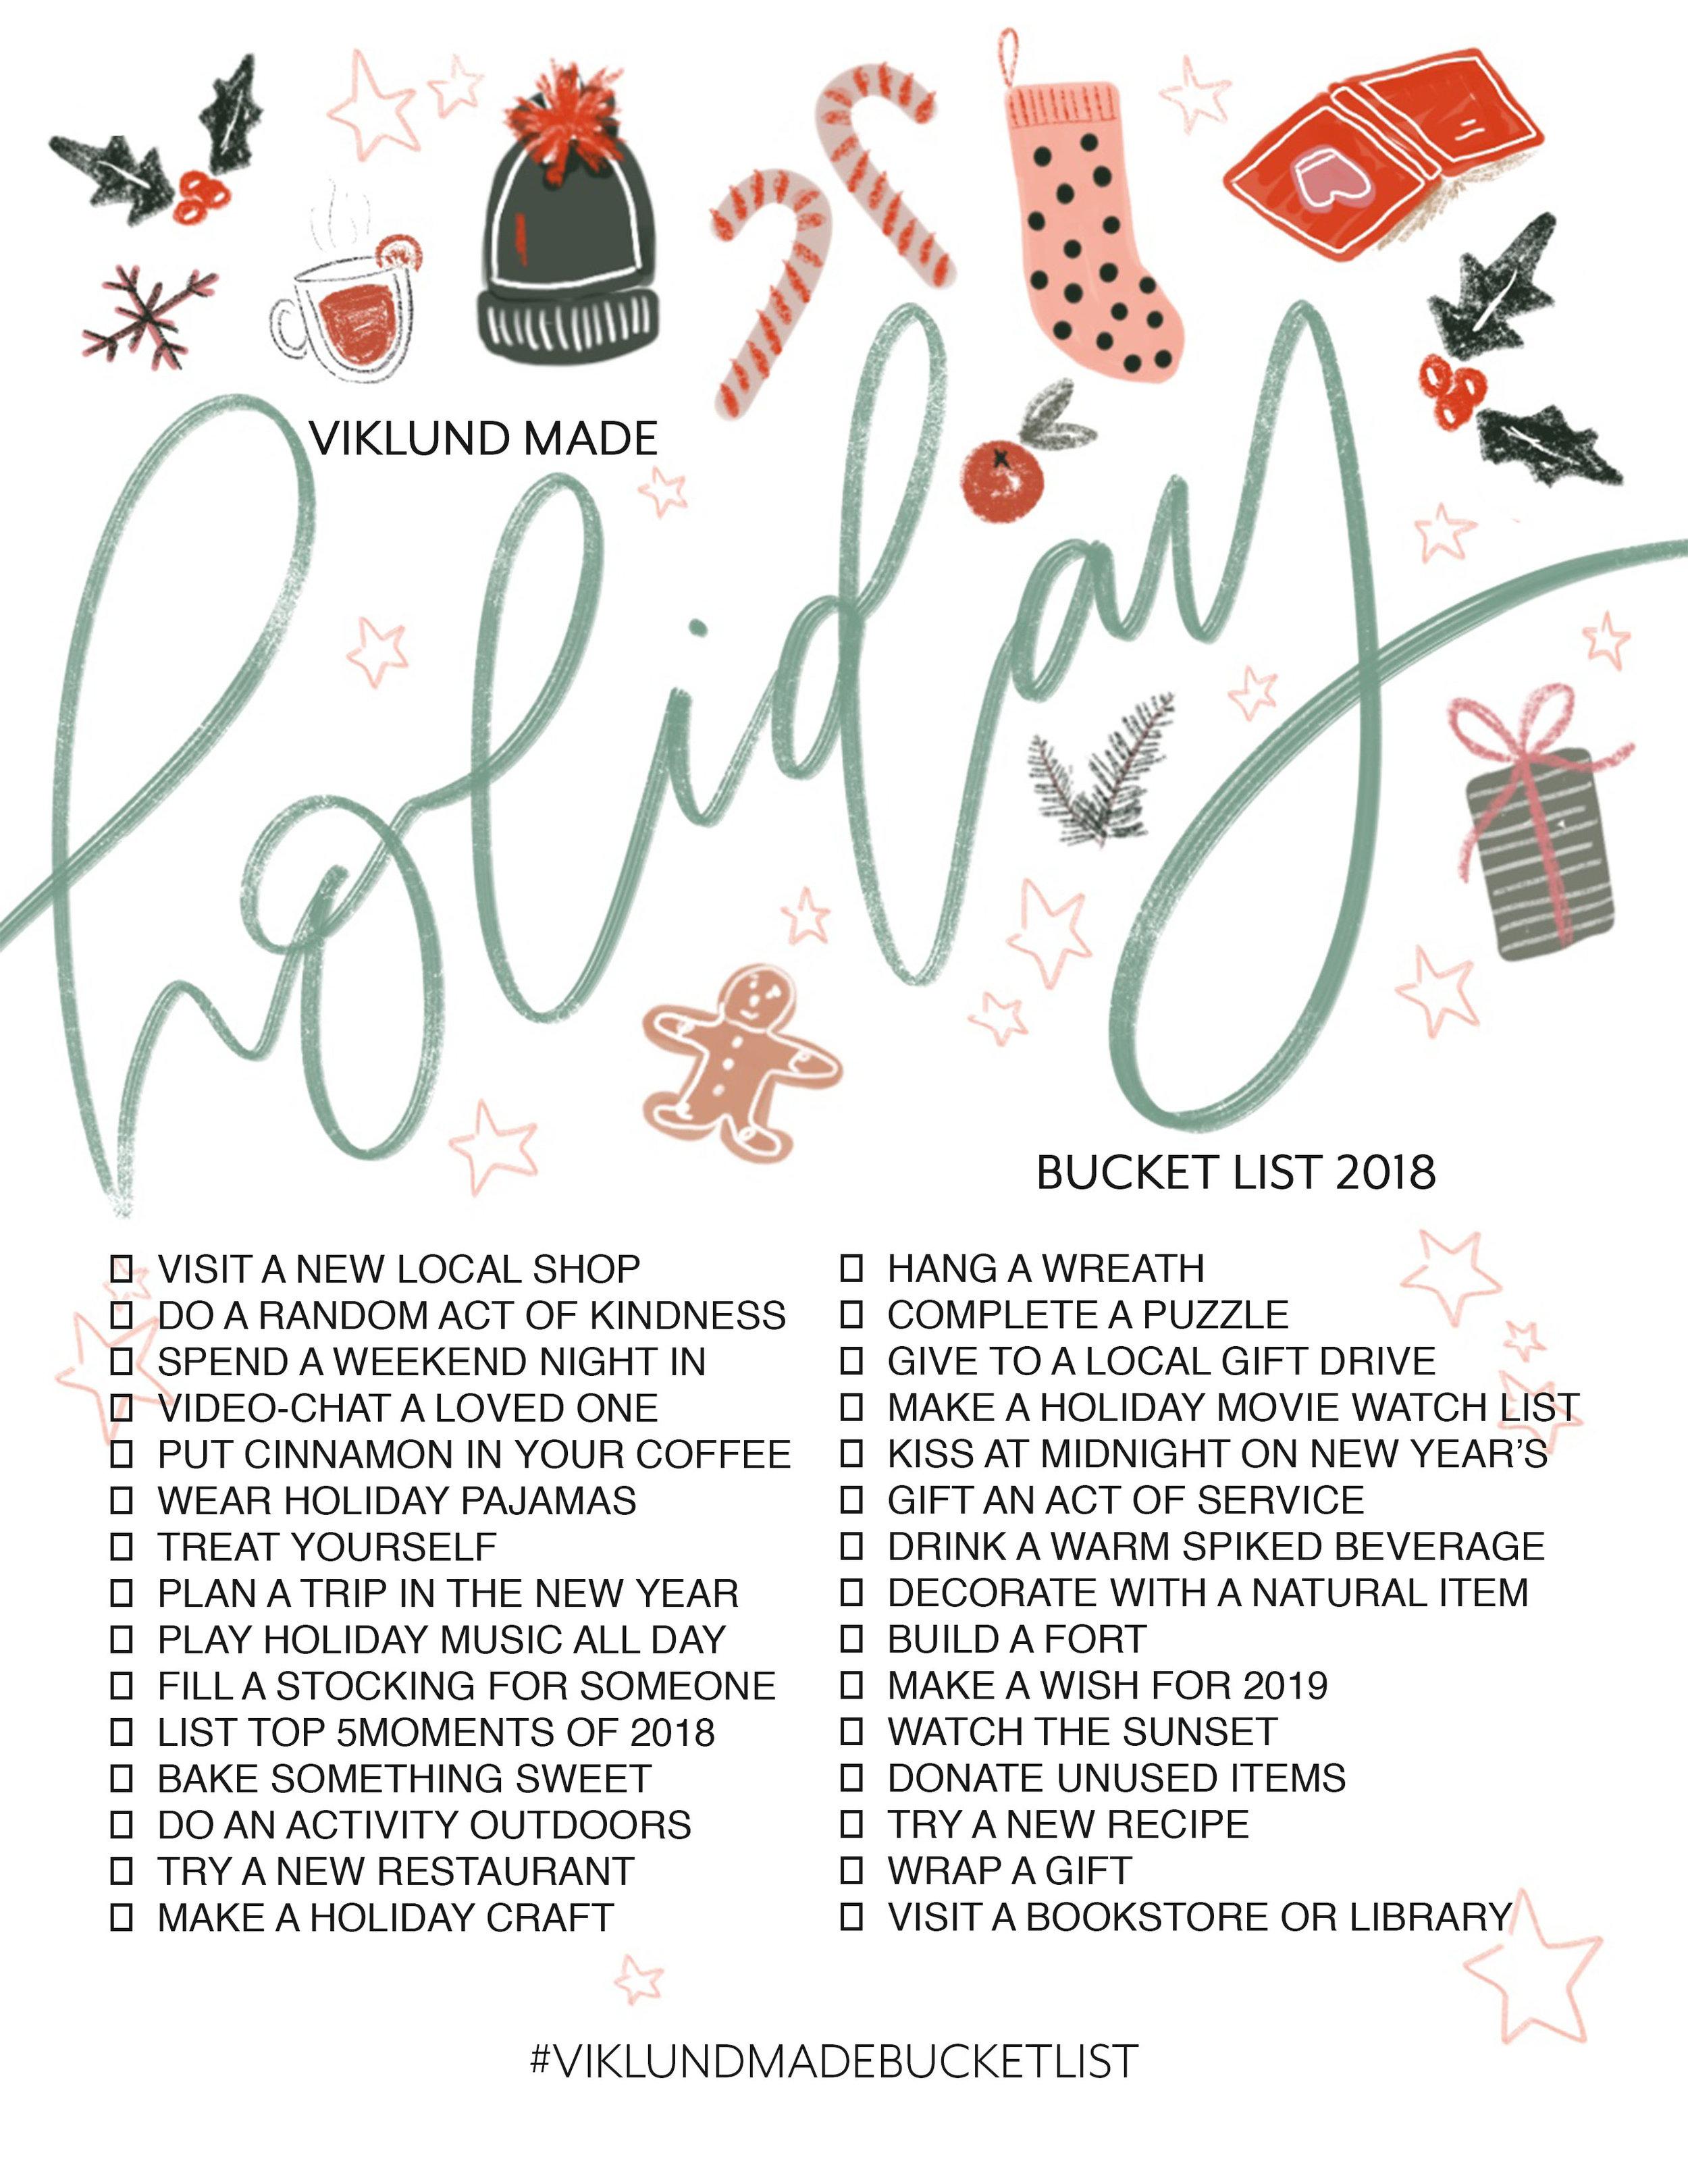 Viklund Made Holiday Bucket List 2018